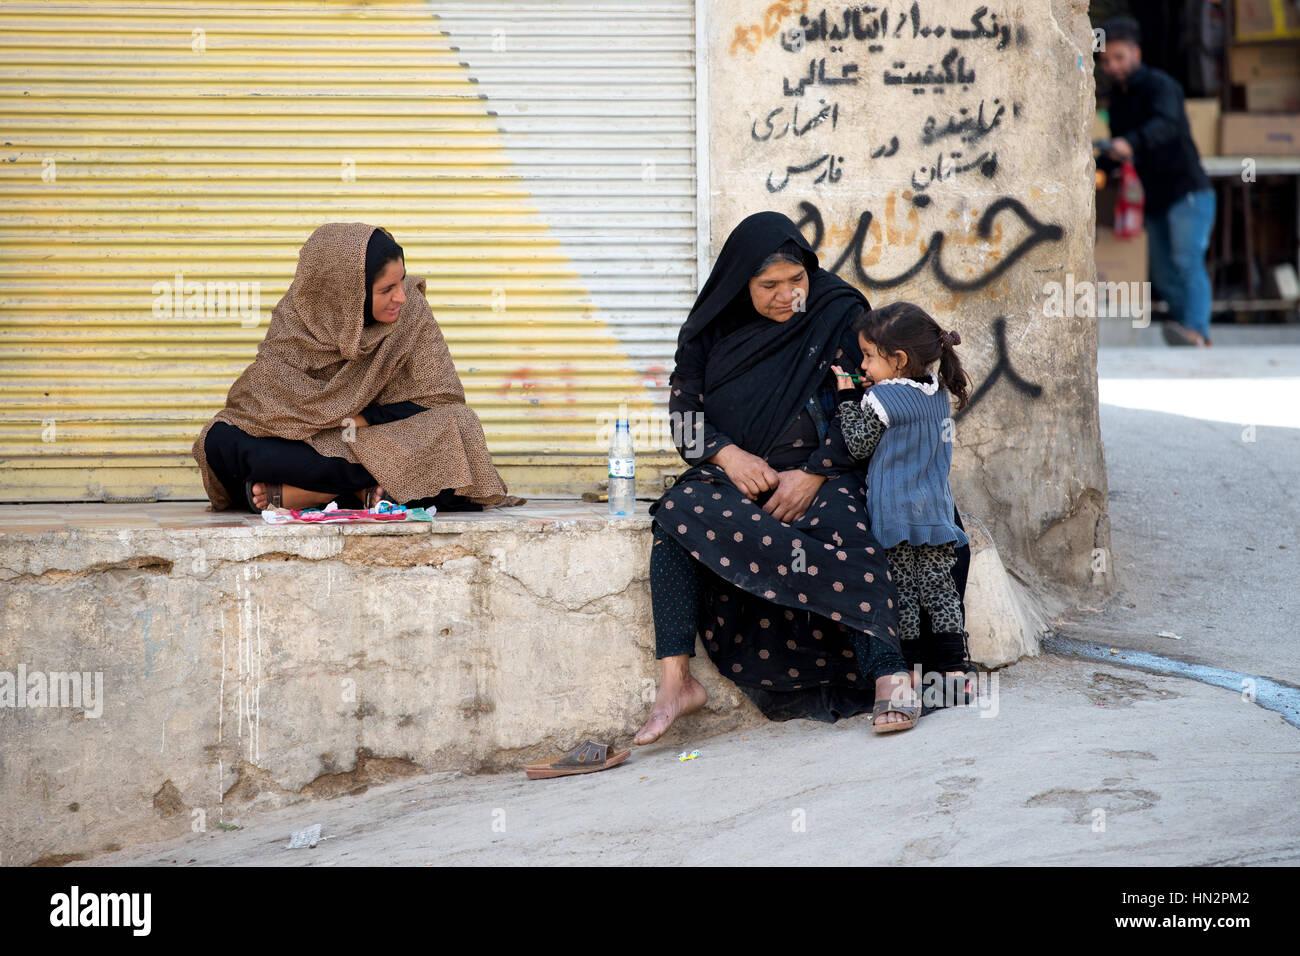 Two Iranian women and a child (probably of Qashqai ethnic minority), Shiraz, Iran - Stock Image